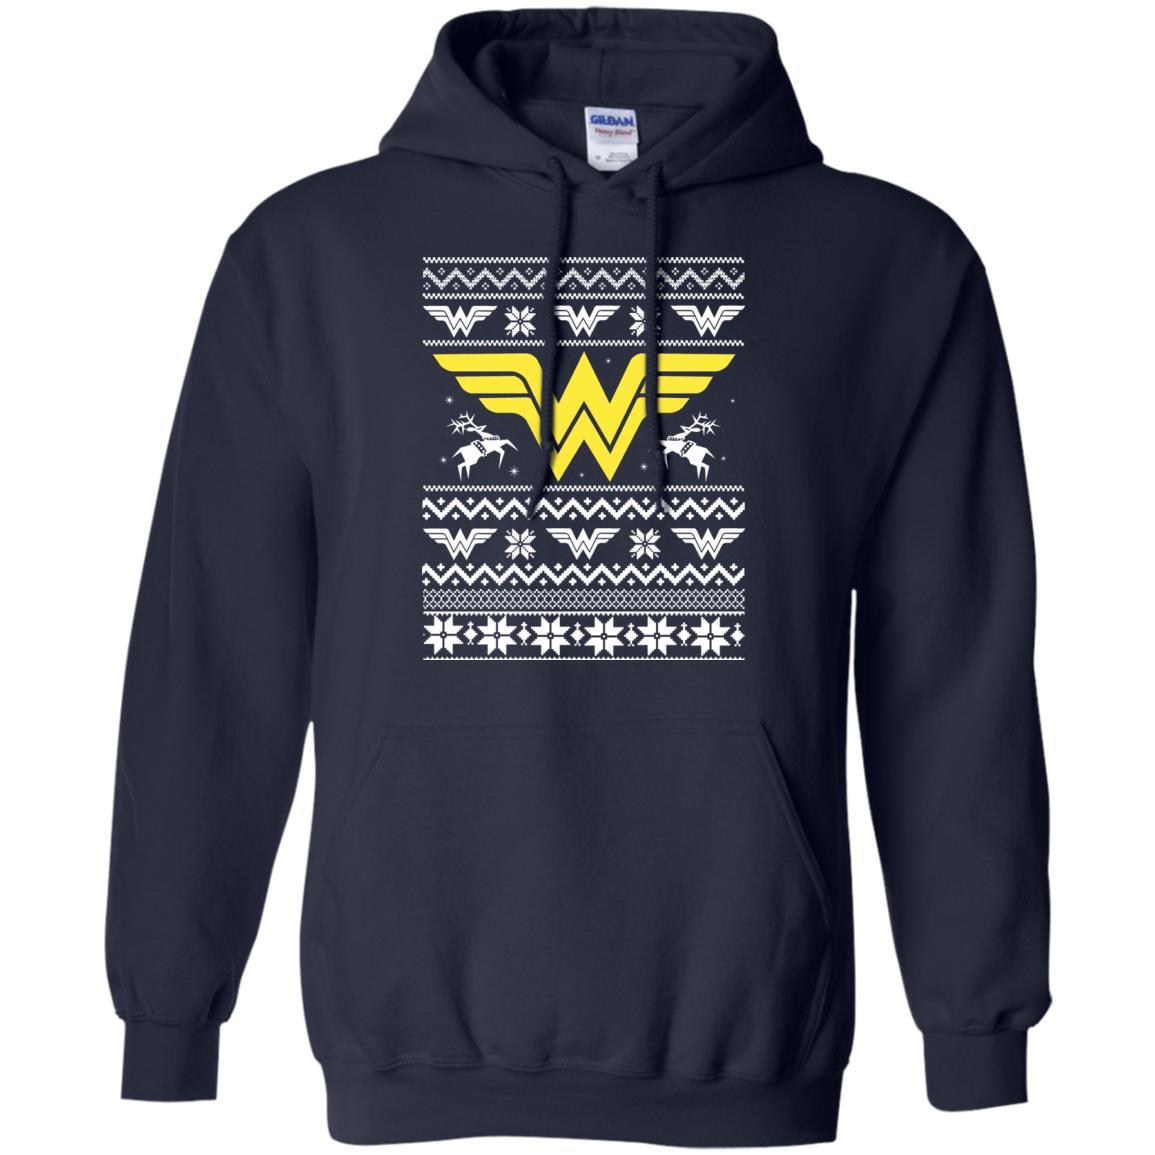 image 1968 - Wonder Woman Christmas Ugly Sweater, Hoodie